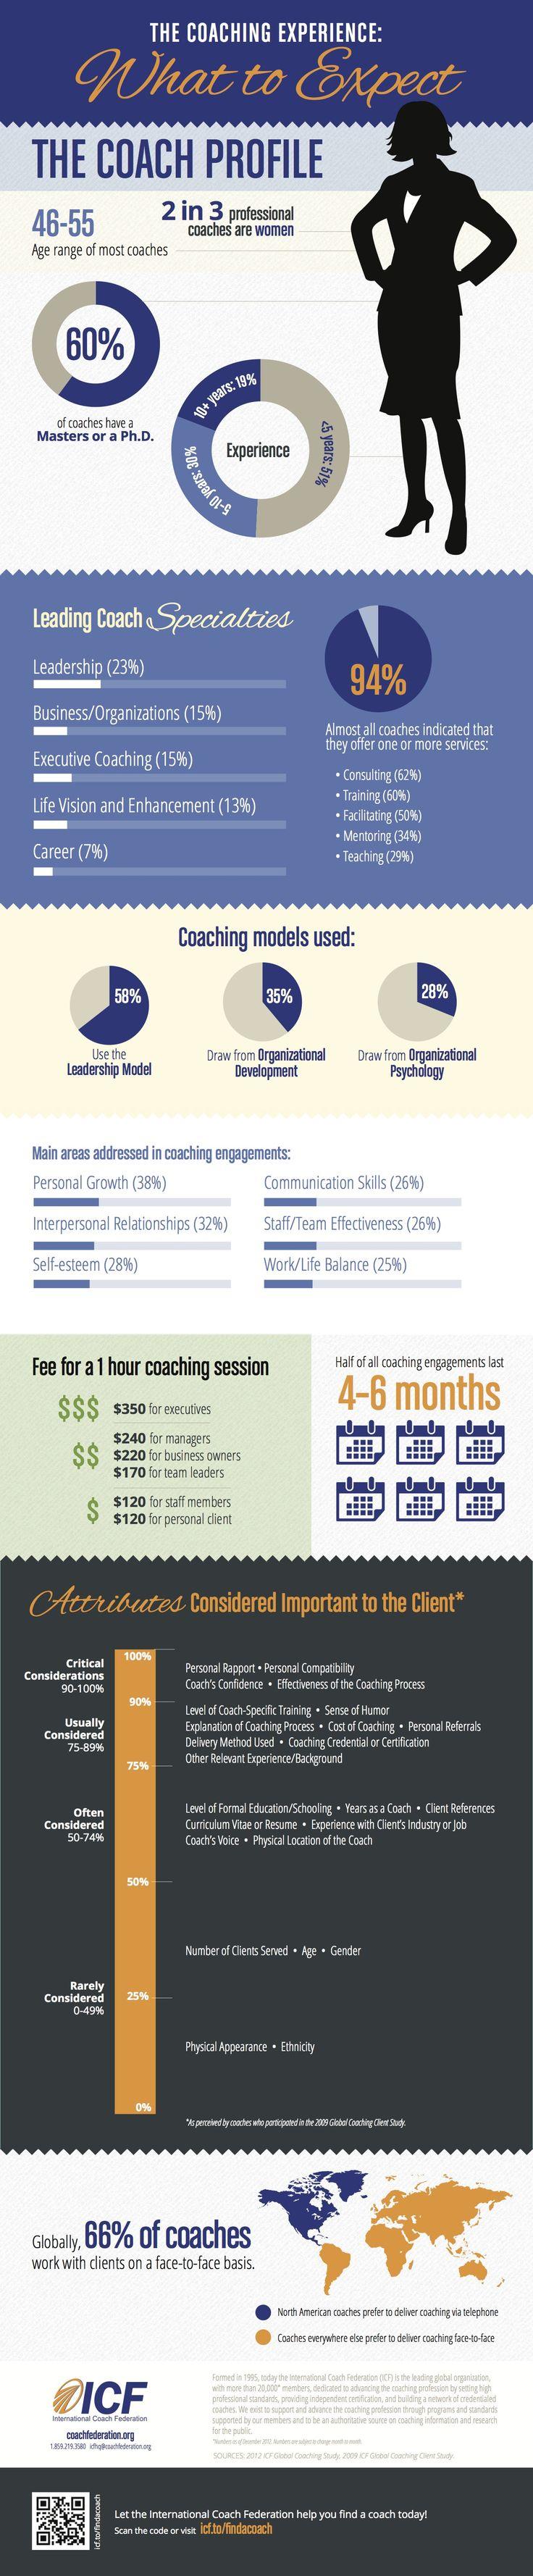 Qué esperar del coaching #infografia #infographic #education